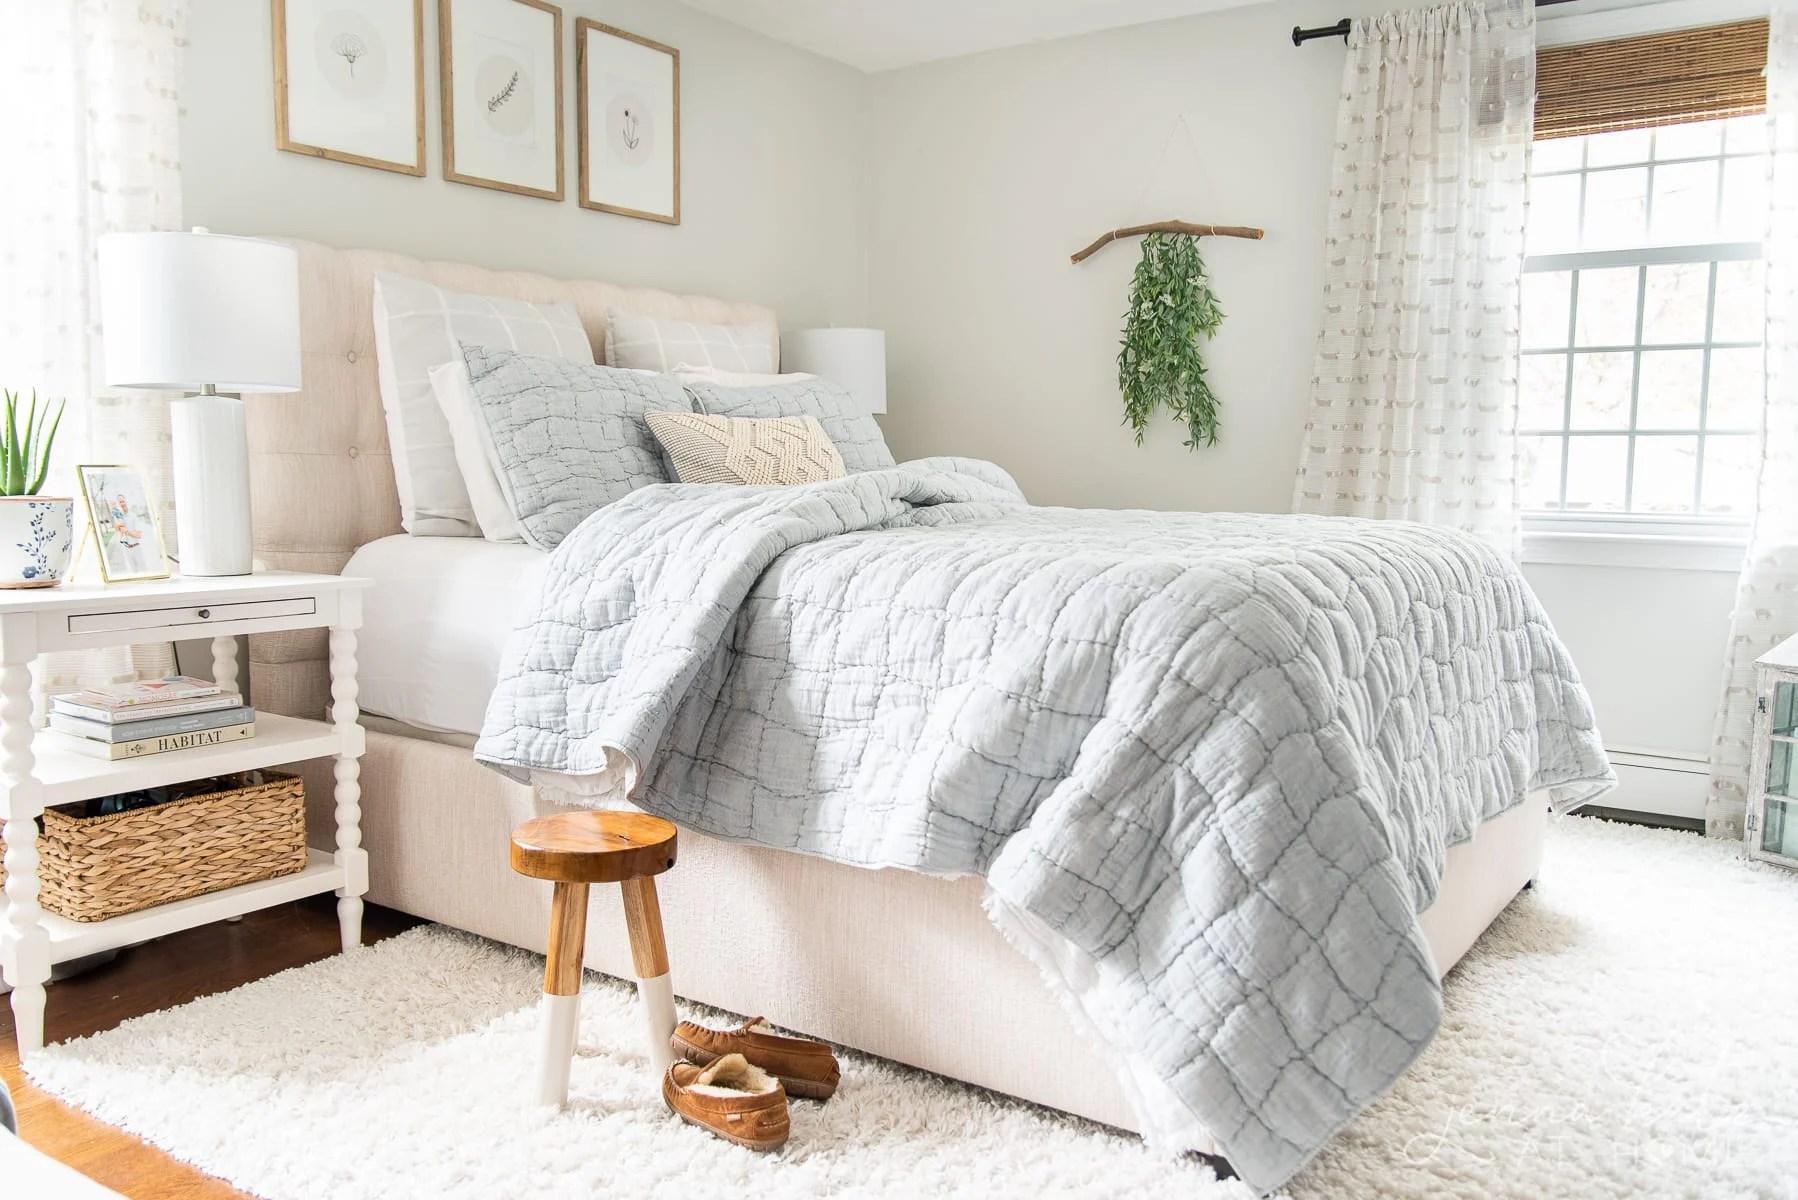 summer bedroom with light blue quilt